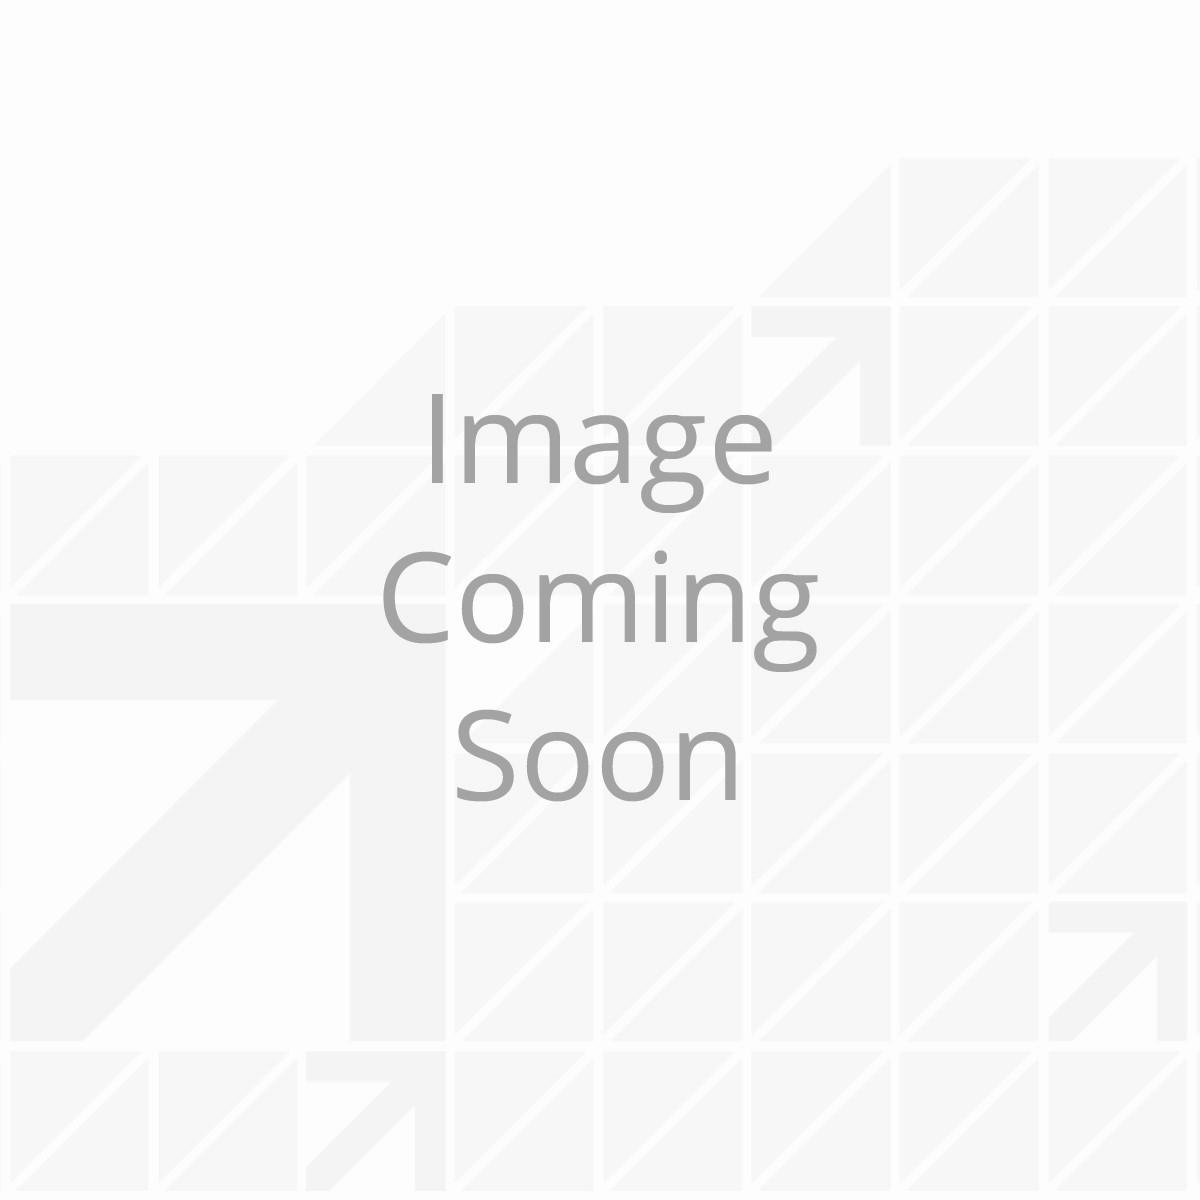 433469_-_14k_hydraulic_jack_-_001